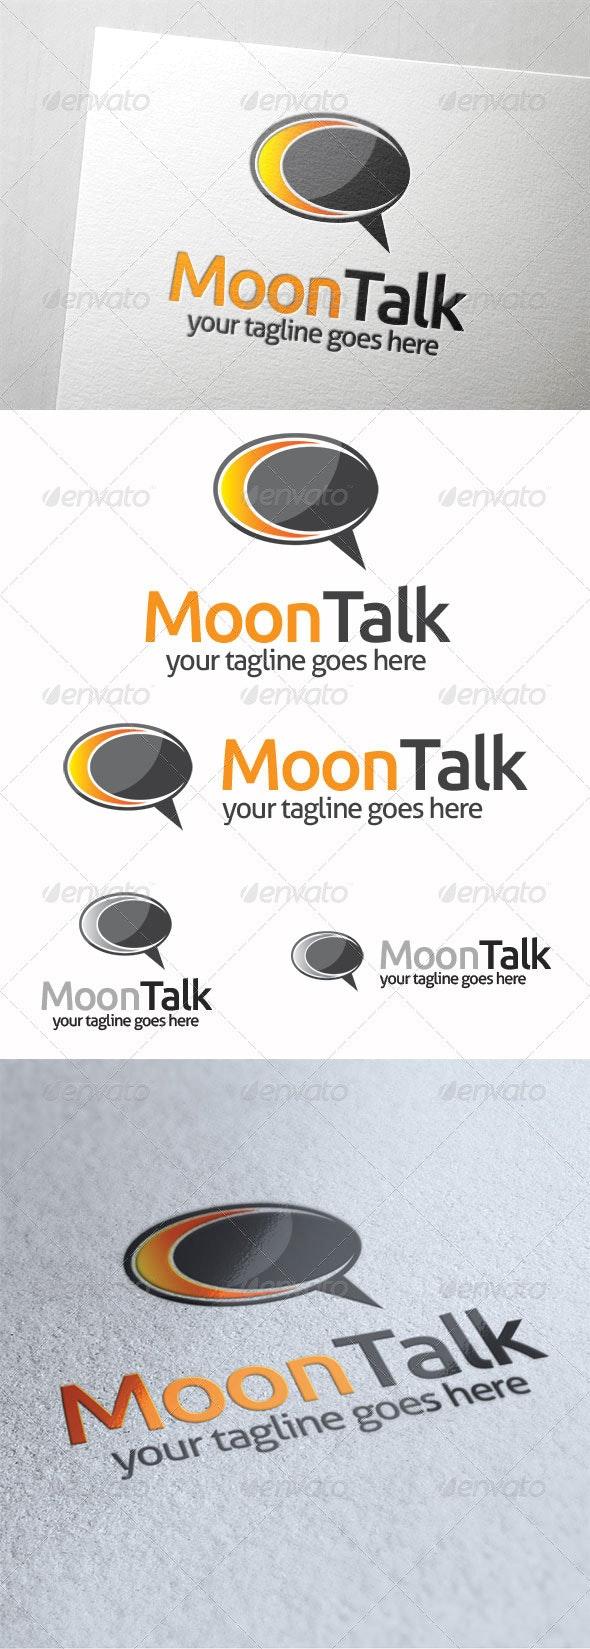 Moon Talk